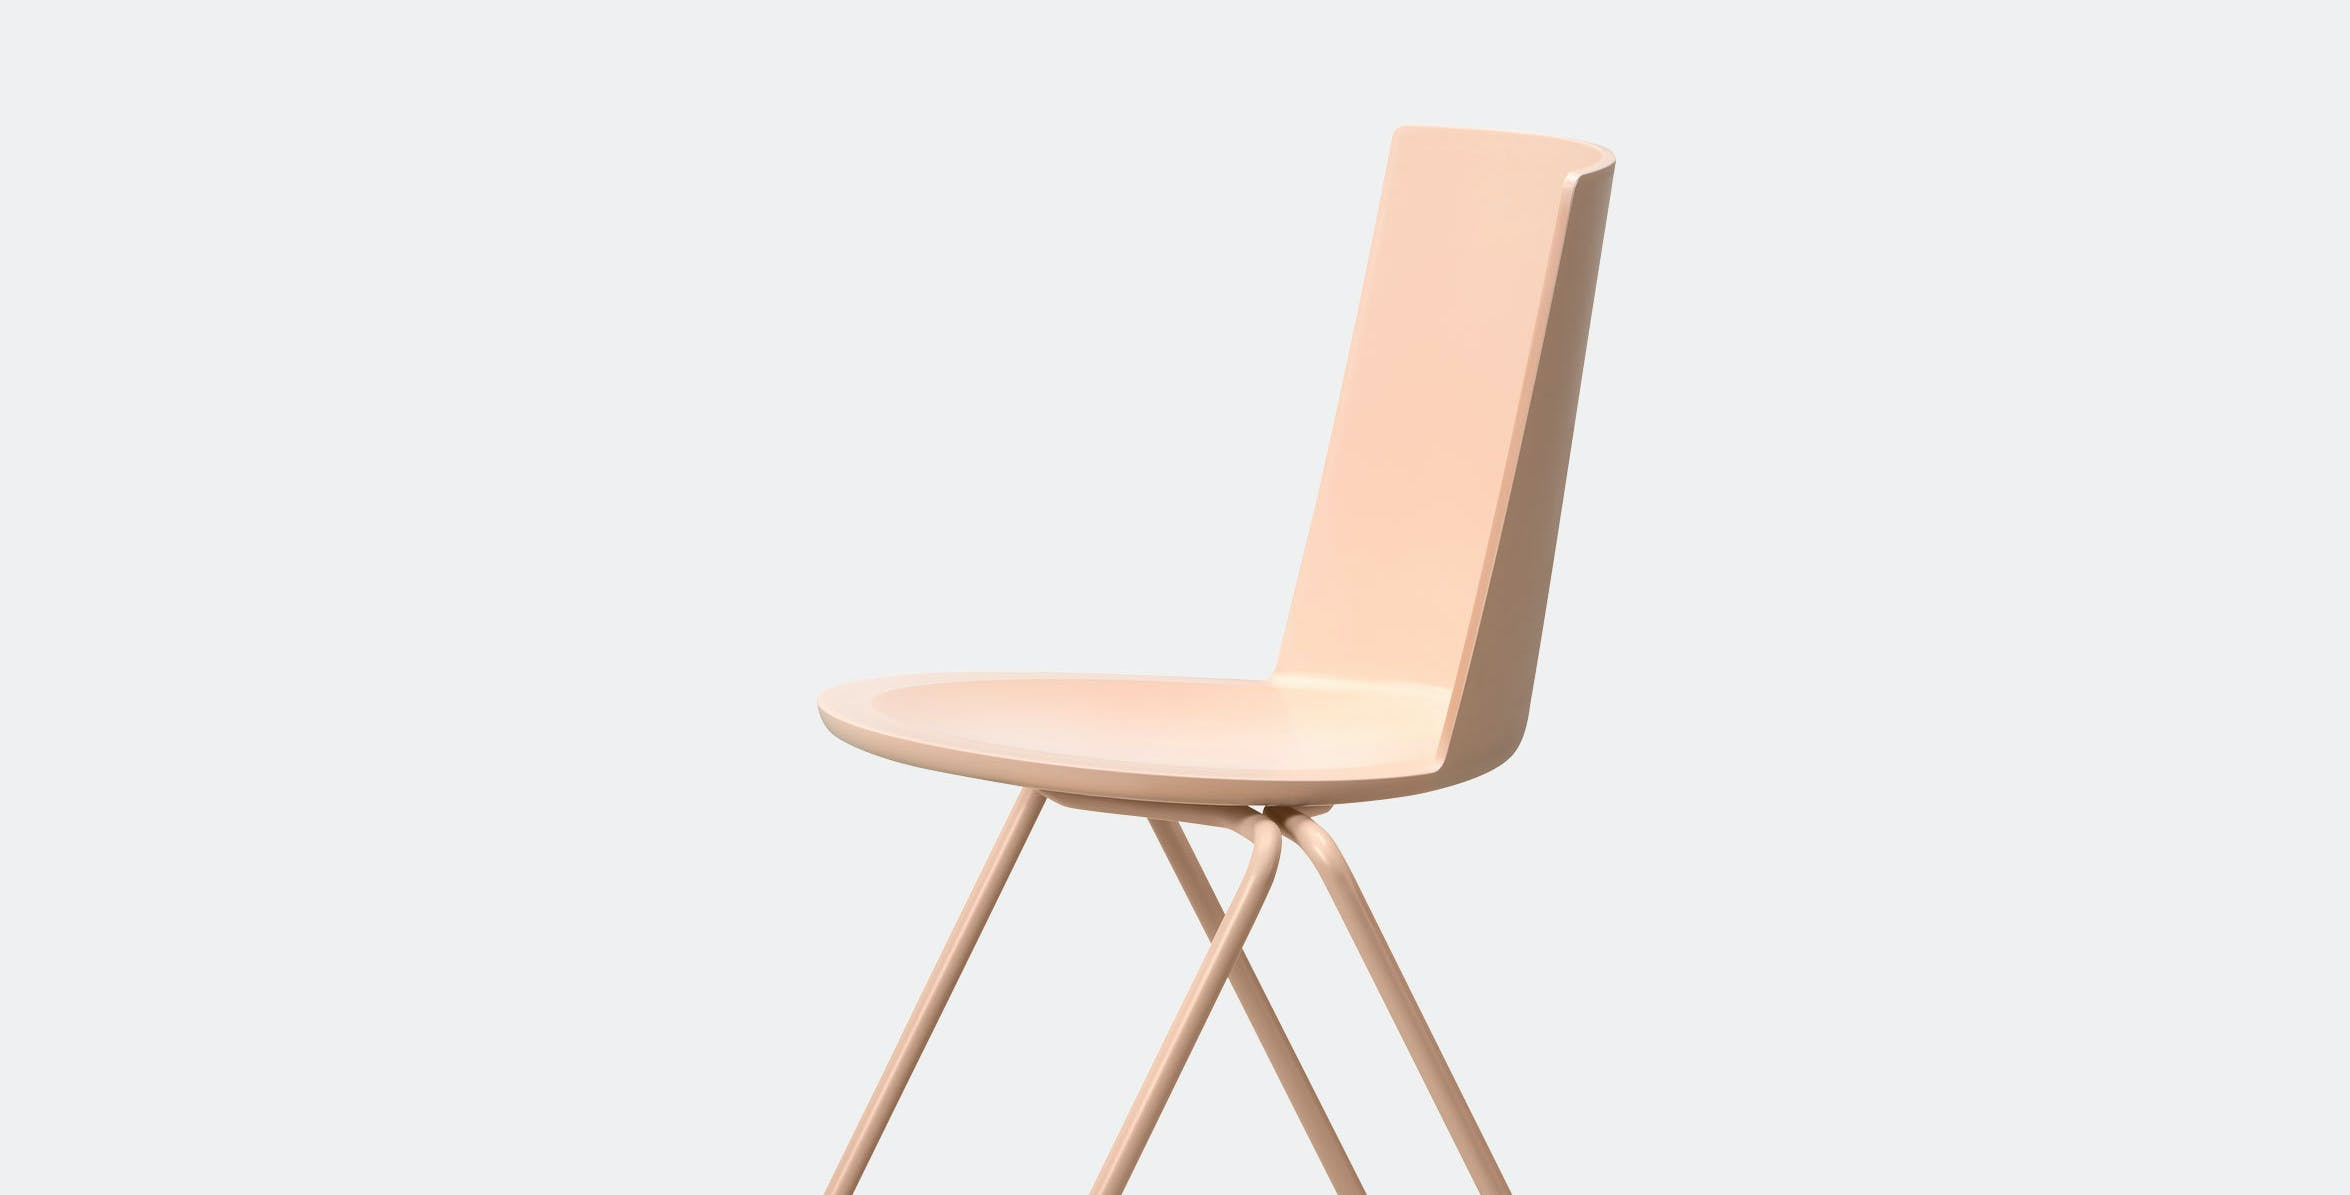 Designer Geckeler Michels